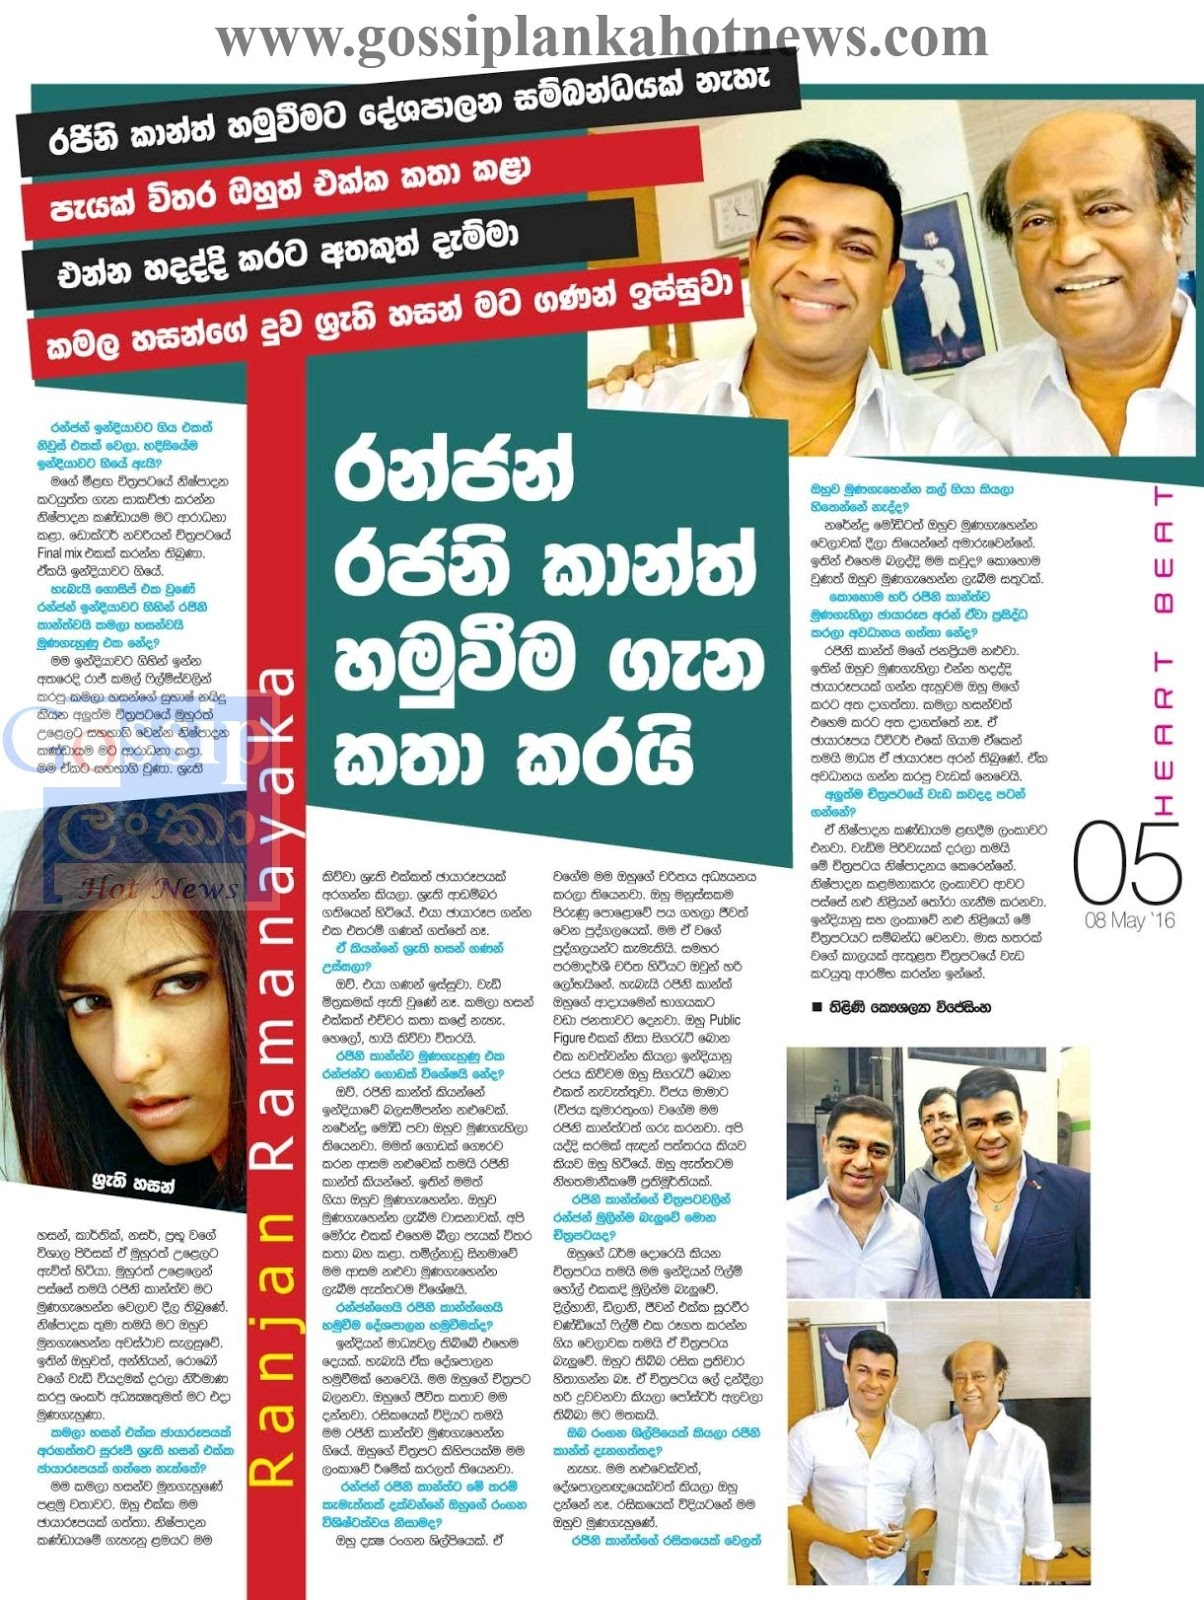 Ranjan Ramanayake meets Superstar Rajinikanth